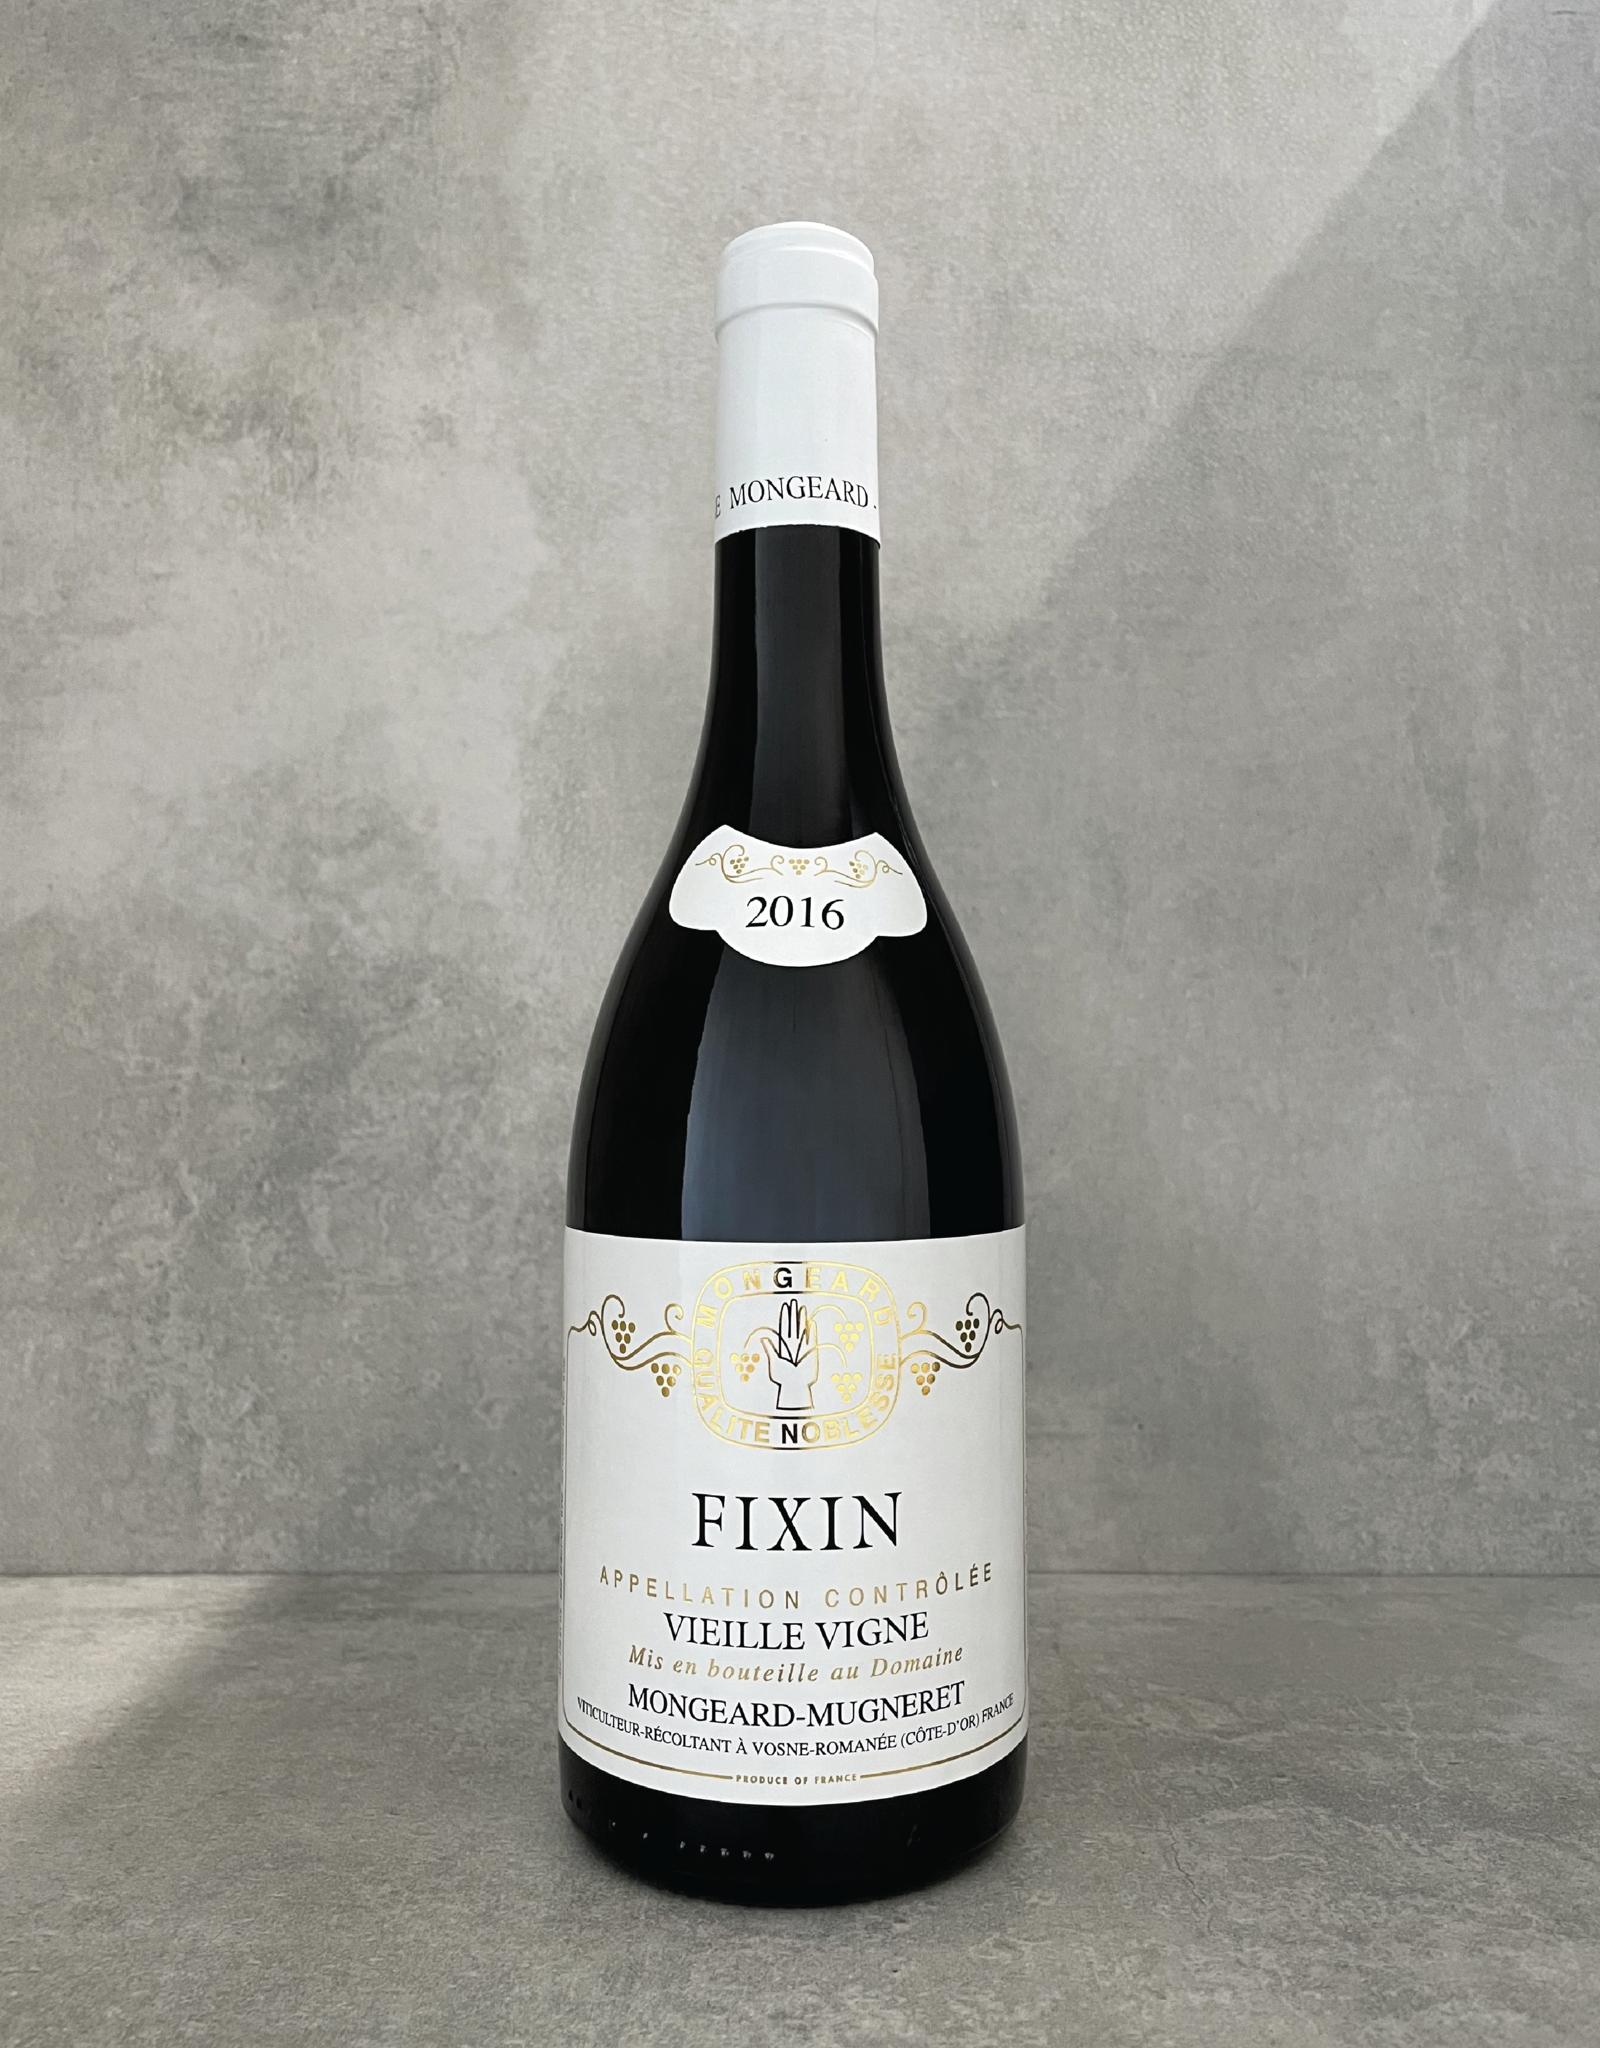 Mongeard-Mugneret Fixin vieille vigne 2016